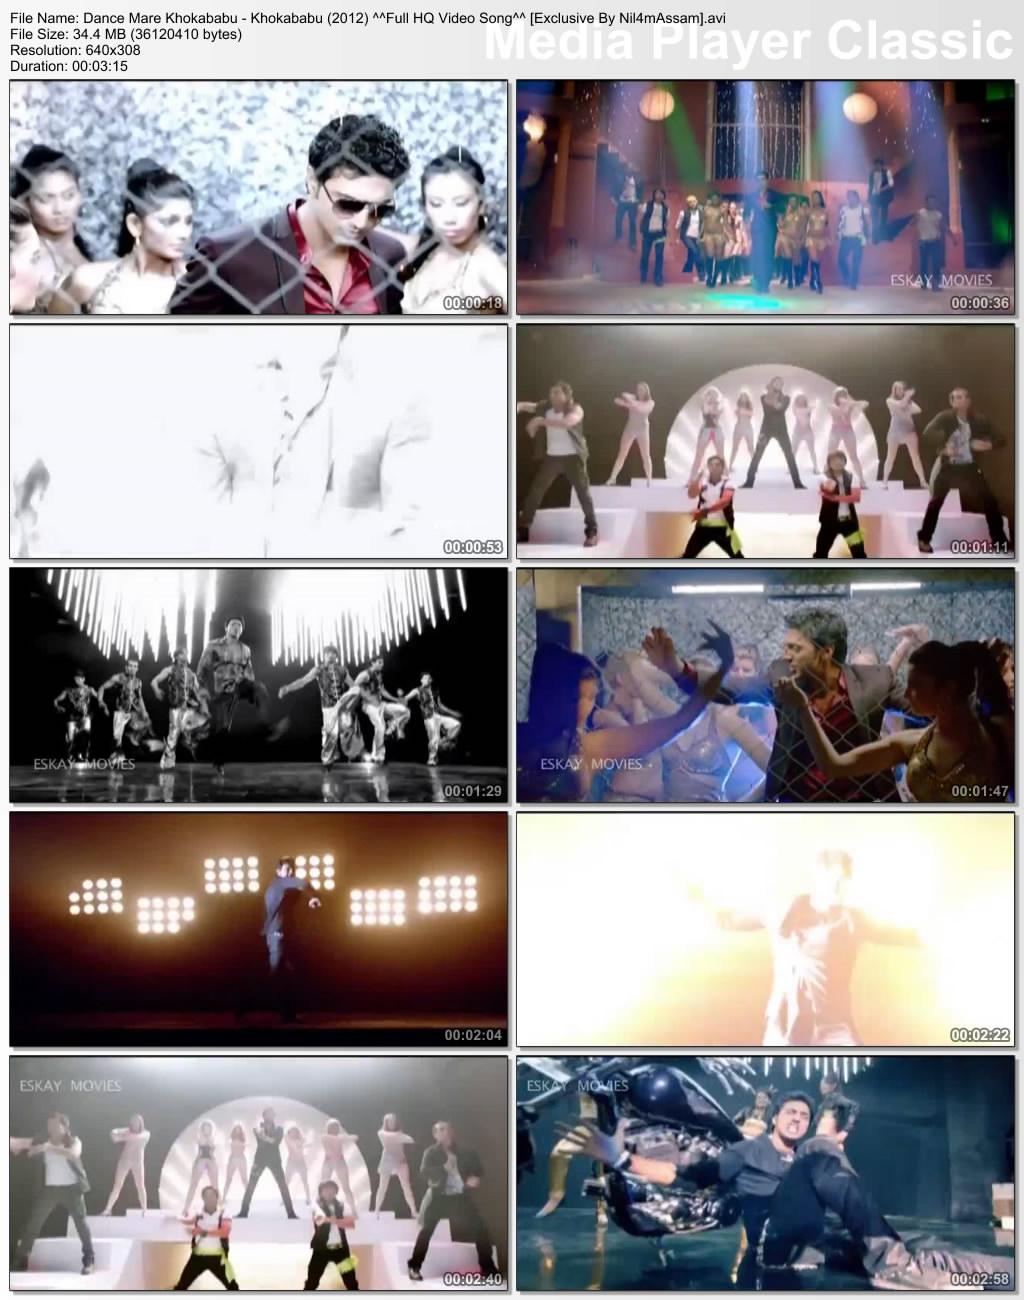 Dance Mare Khokababu - Khokababu 2012 Movie HQ Video Download